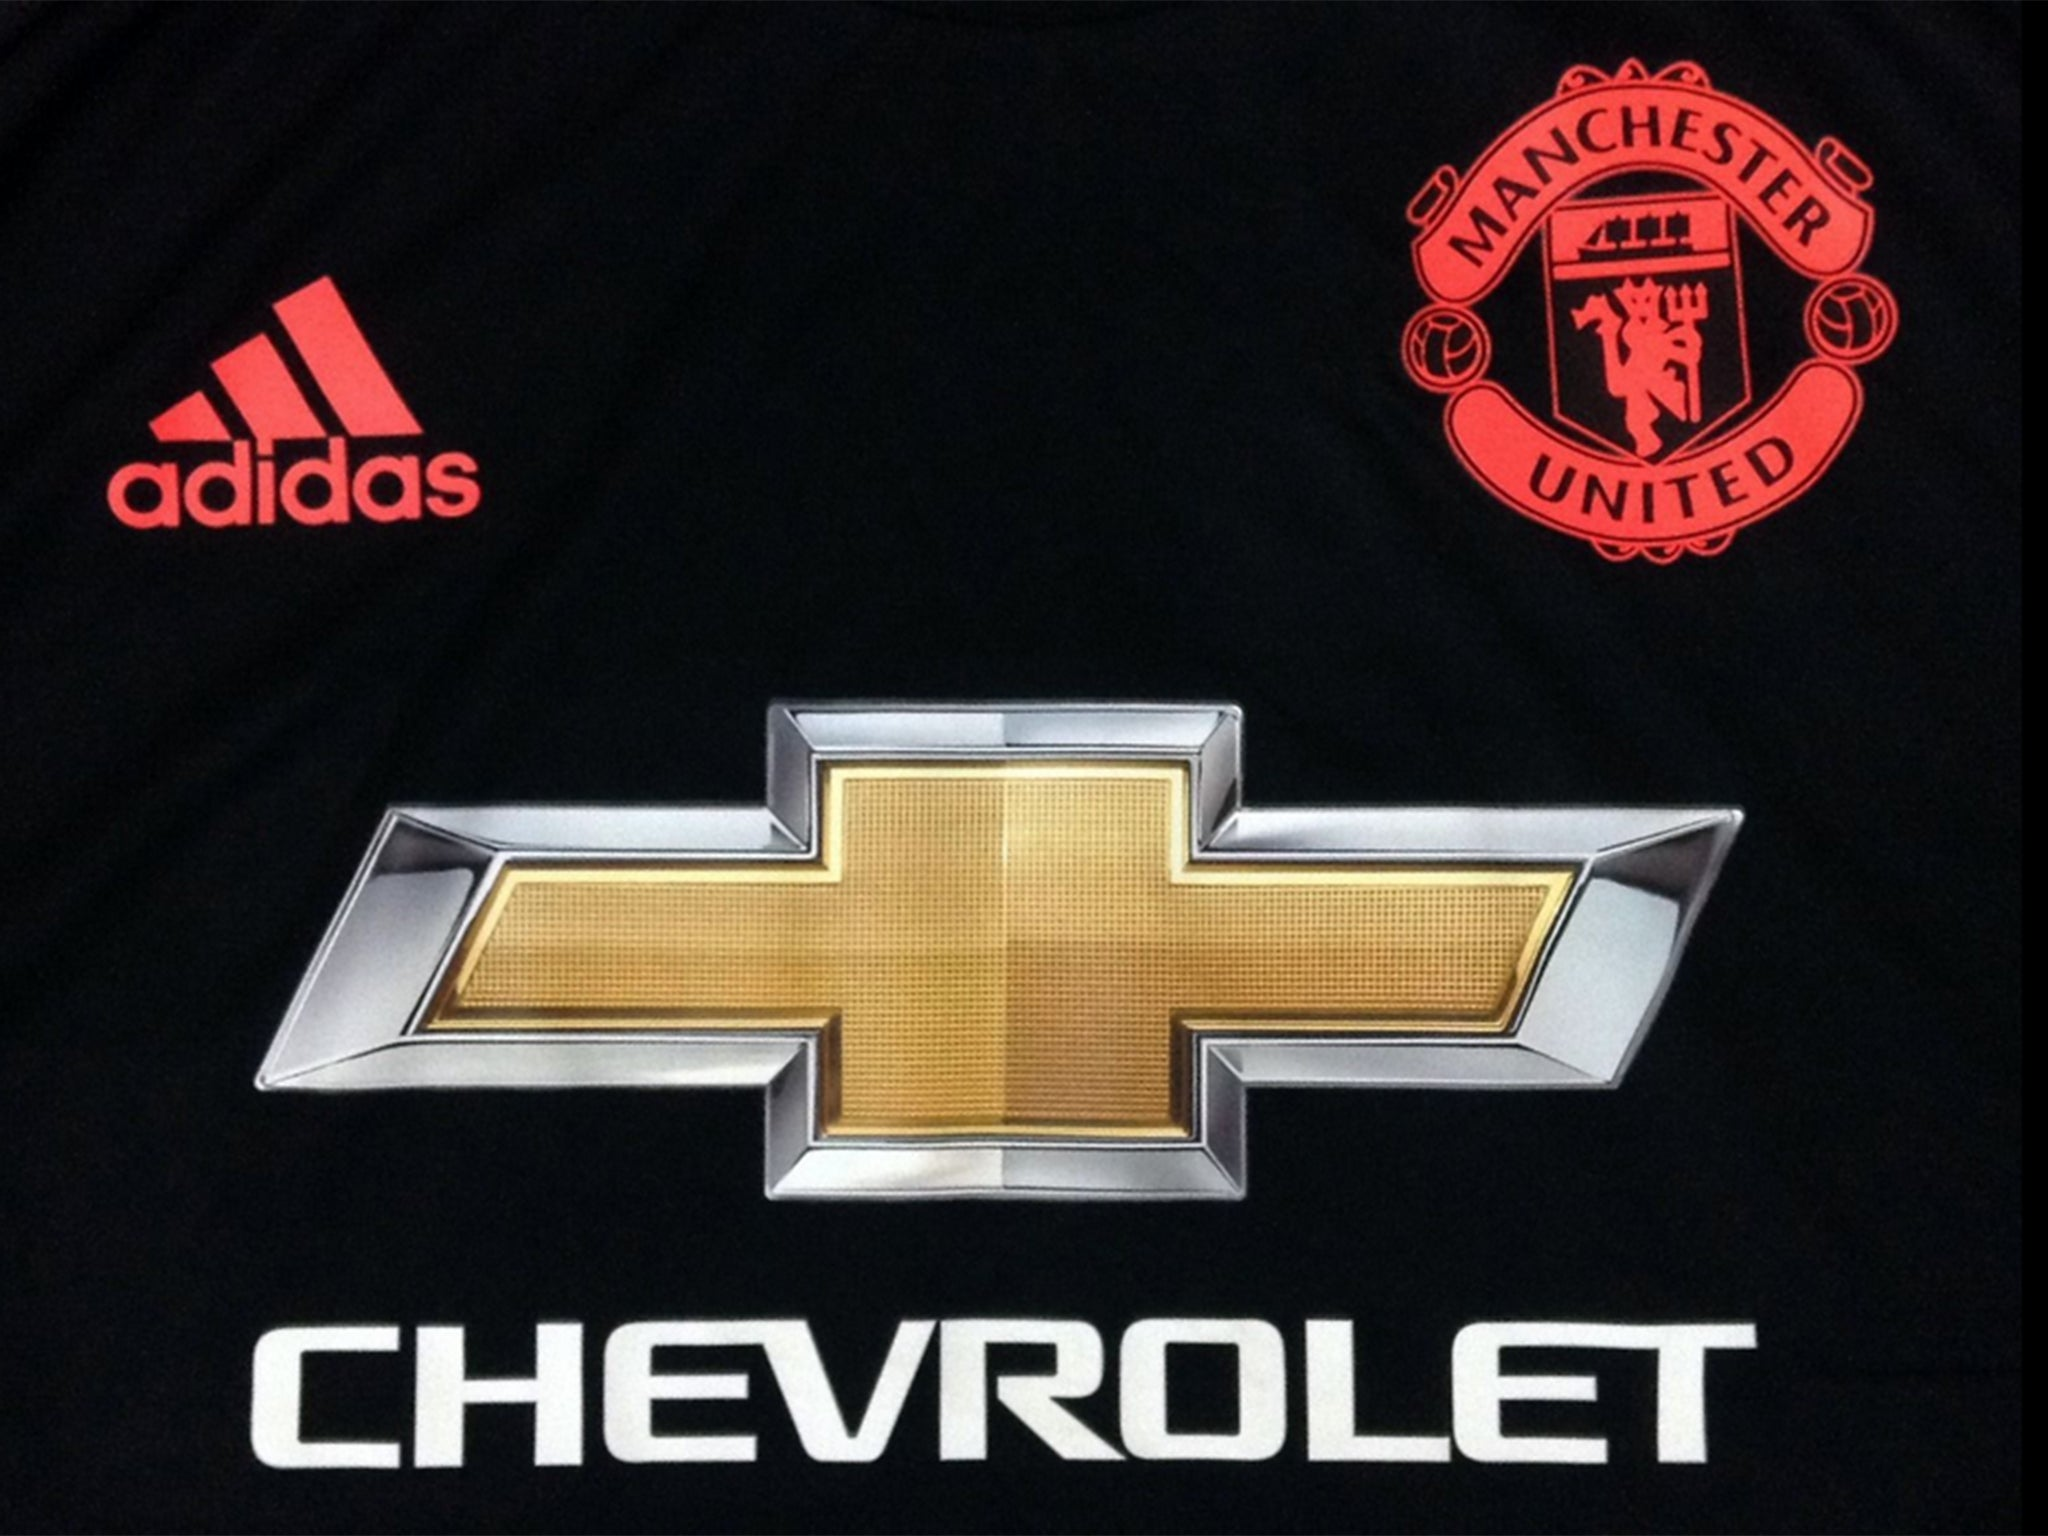 best sneakers 704c3 d66ee Manchester United 2015/16 kit leak: Orange and black strip ...